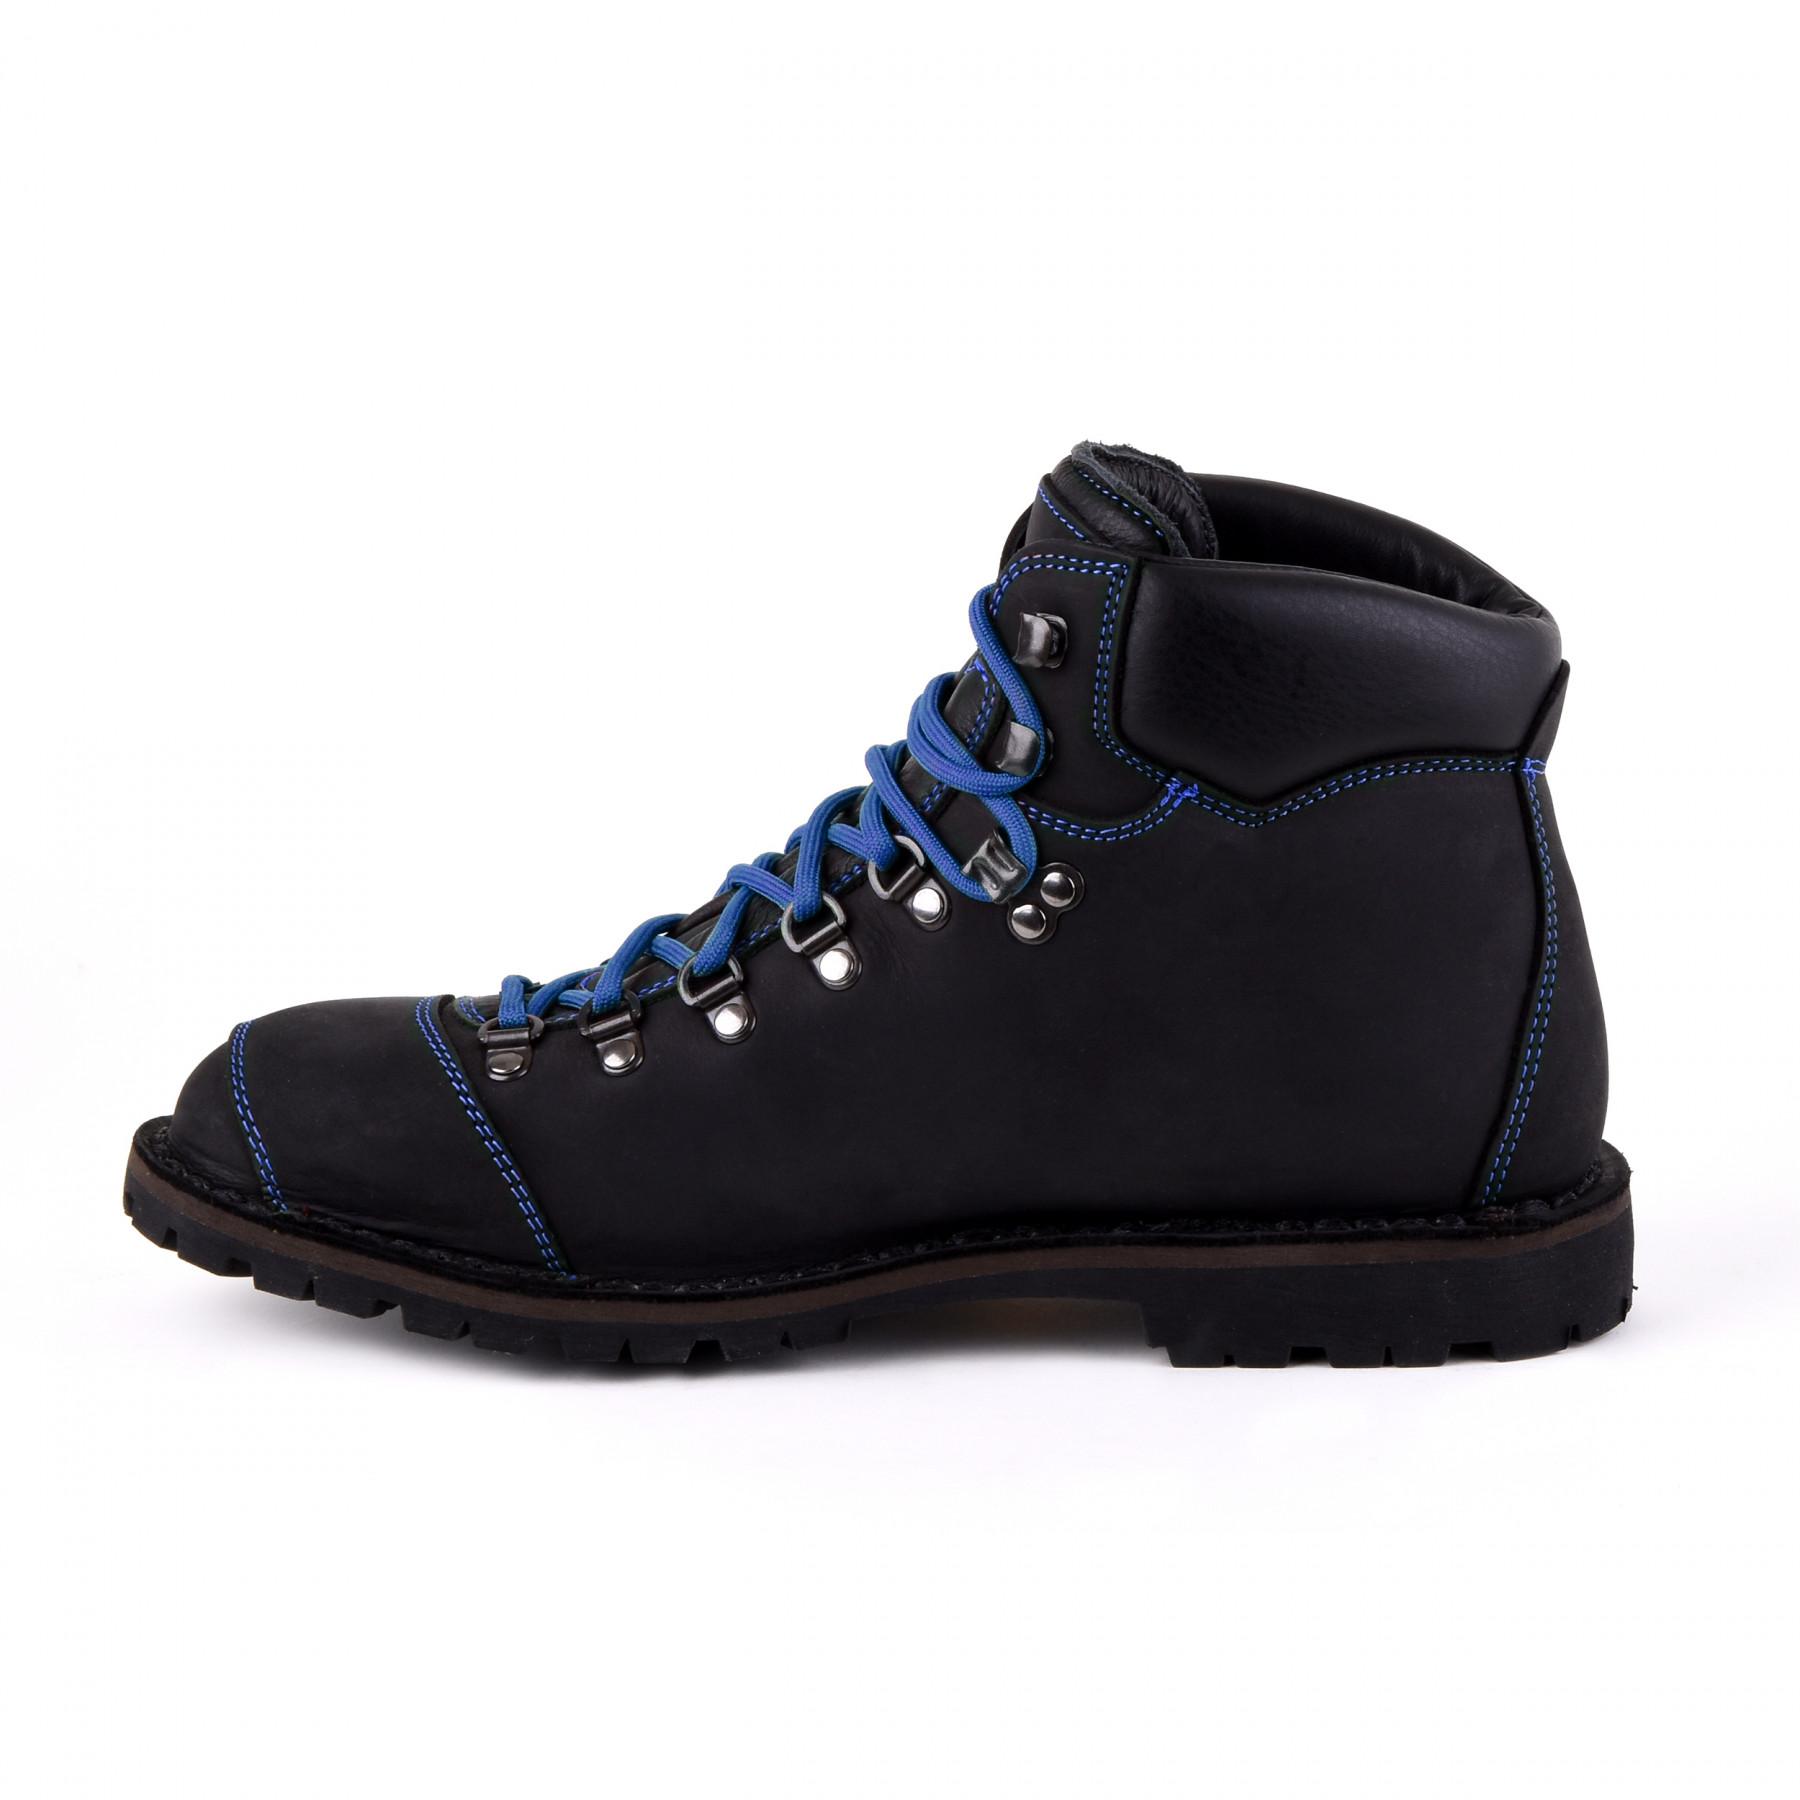 Biker Boot Adventure Denver Black, black ladies boot, blue stitching, size 36